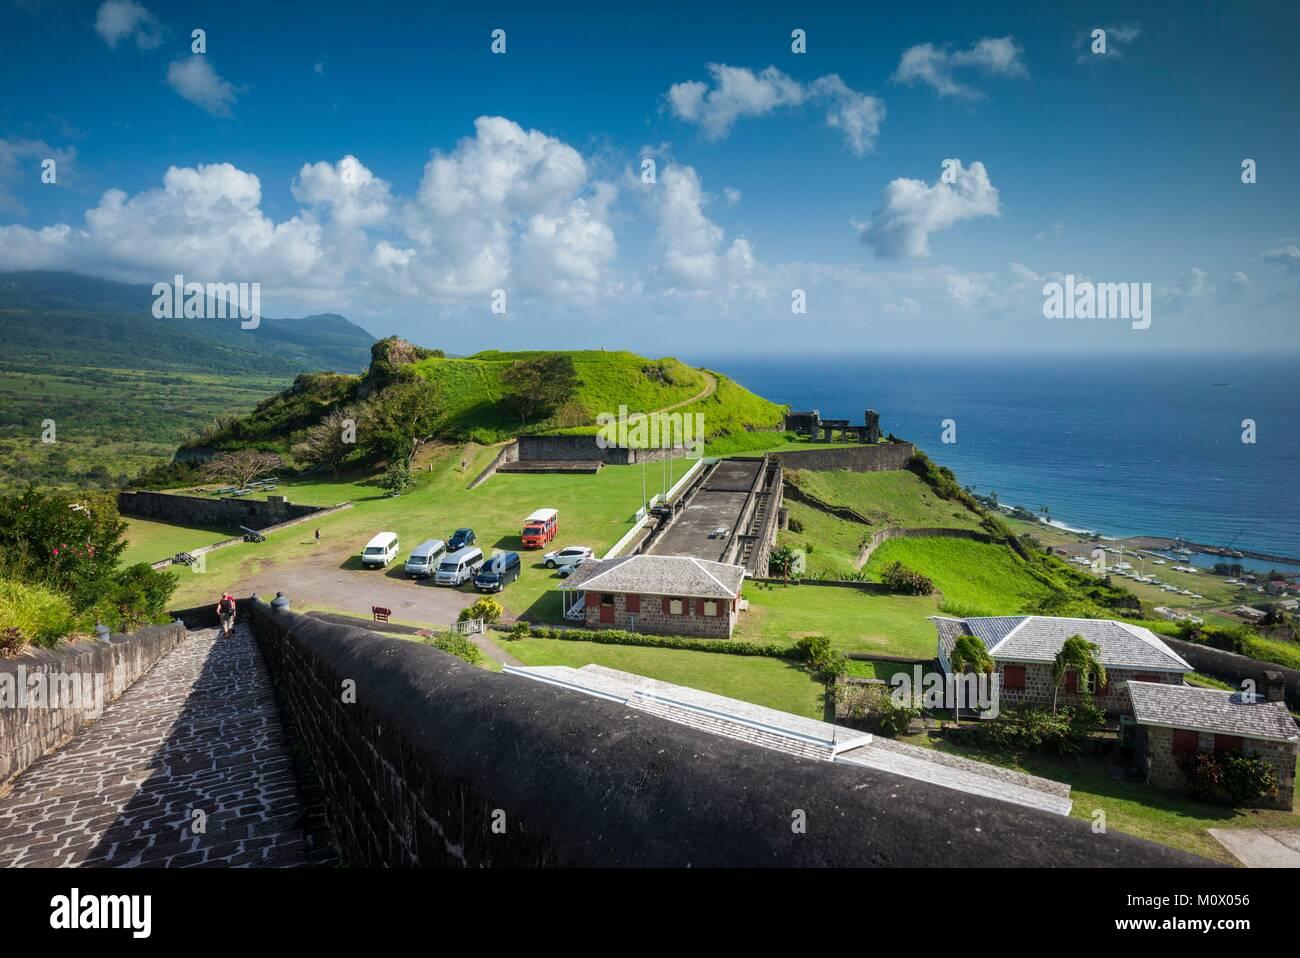 Saint Kitts e Nevis,San Kitts,Brimstone Hill,di Brimstone Hill Fortress Foto Stock